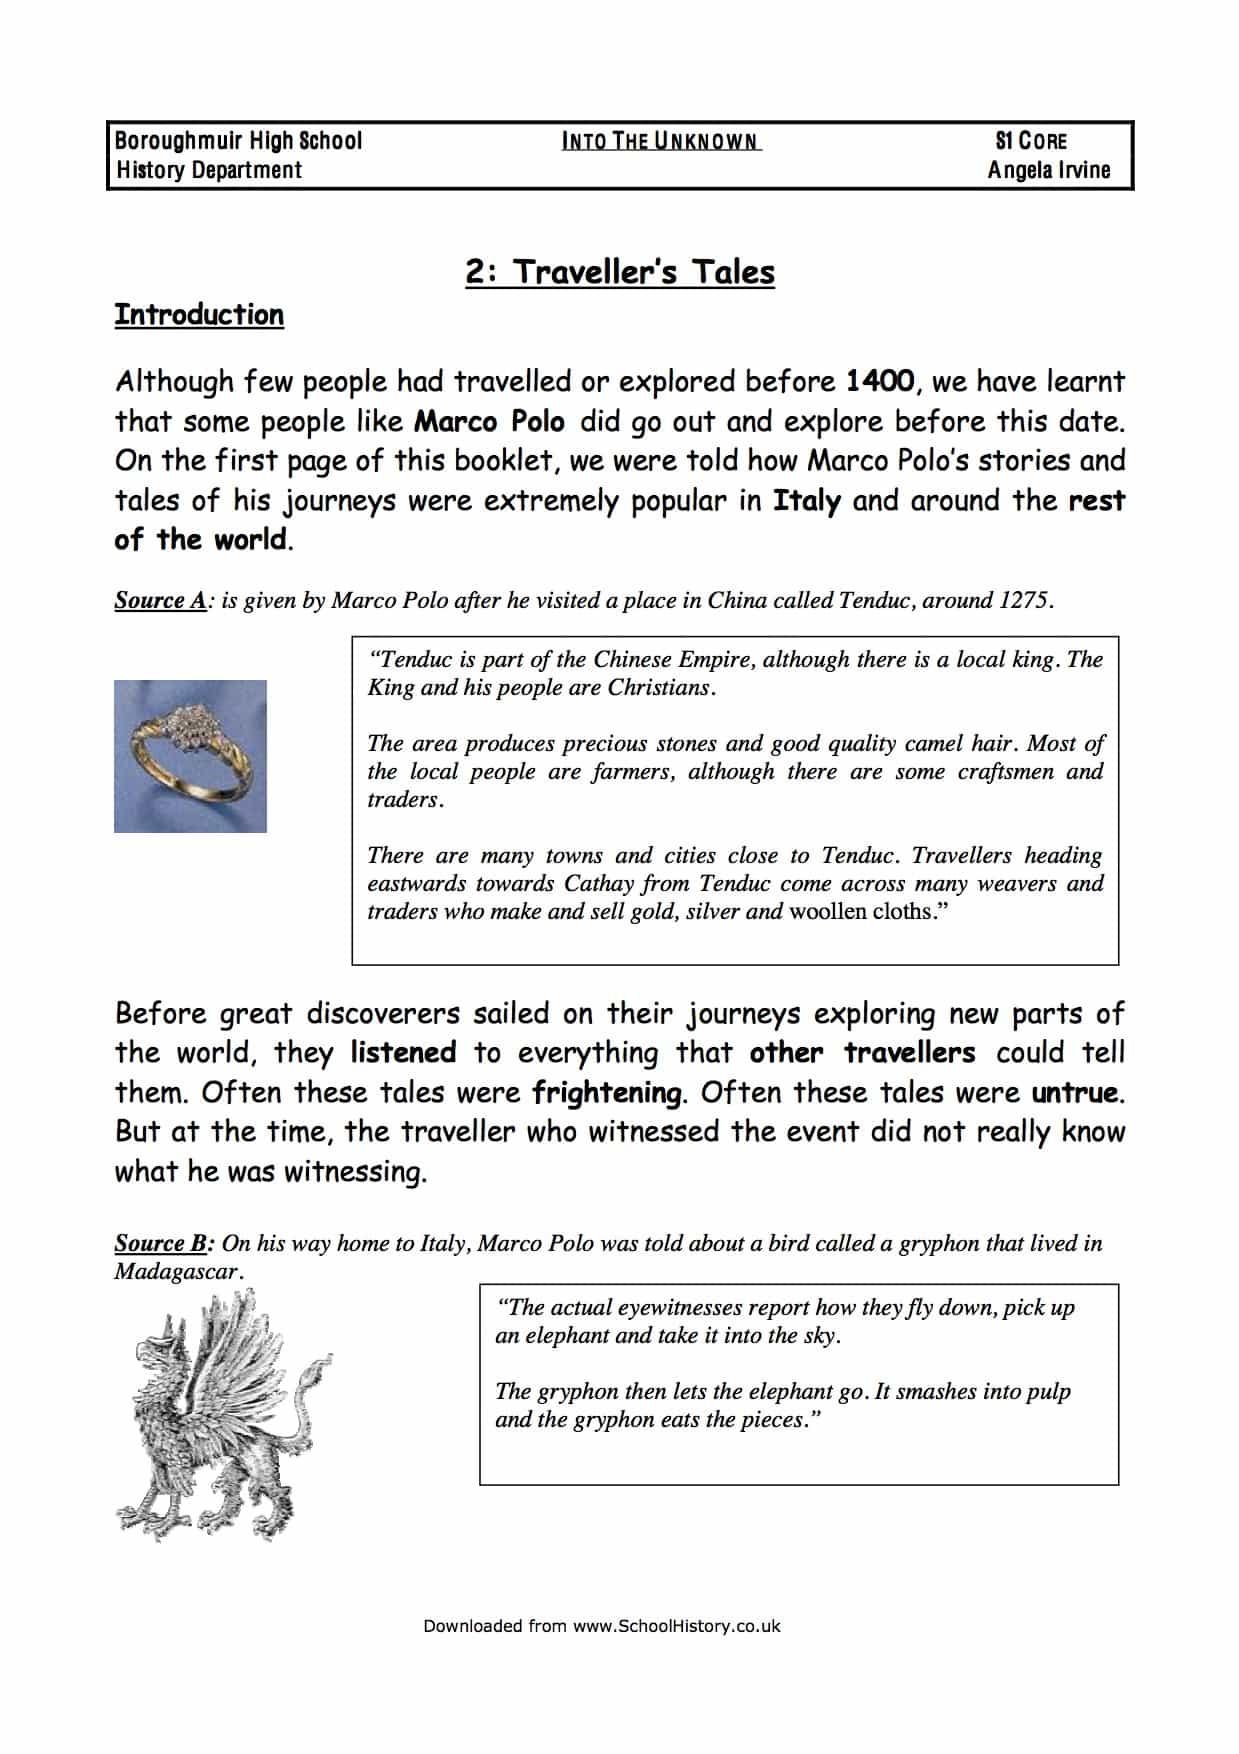 History Worksheets & Lesson Plans - schoolhistory.co.uk